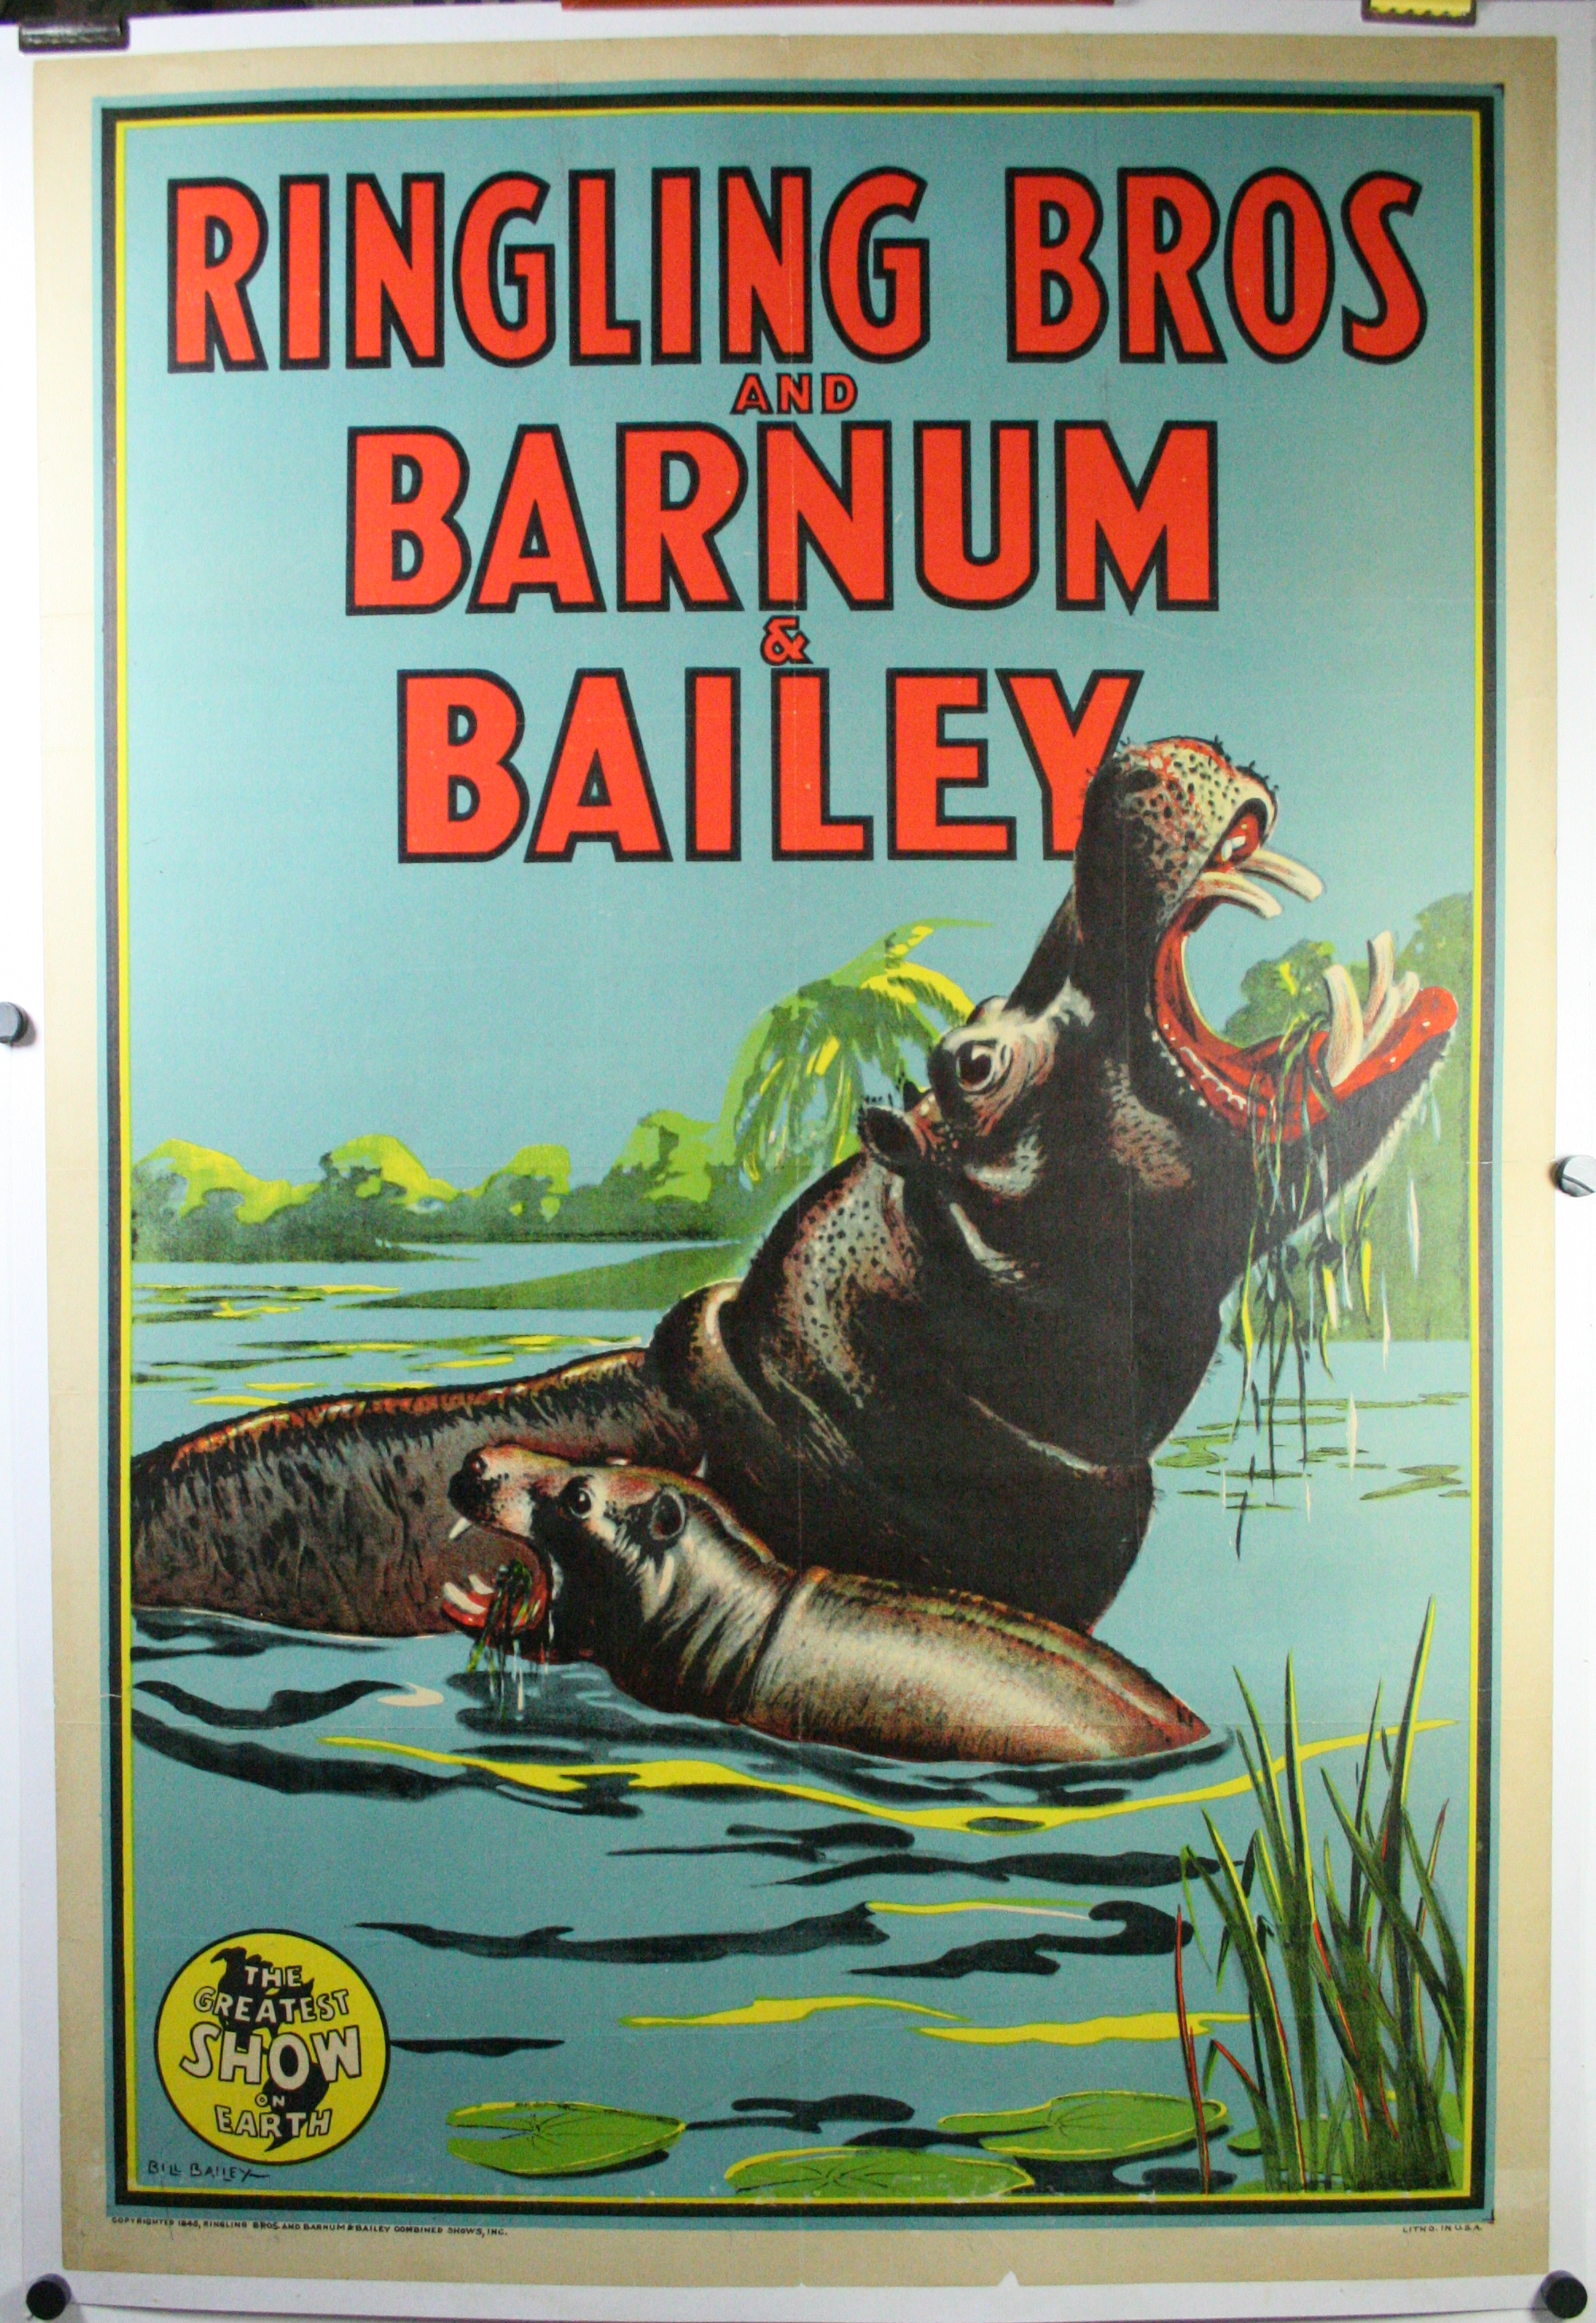 Vintage Barnum /& Bailey Circus Poster CIRCUS0016 Art Print A4 A3 A2 A1